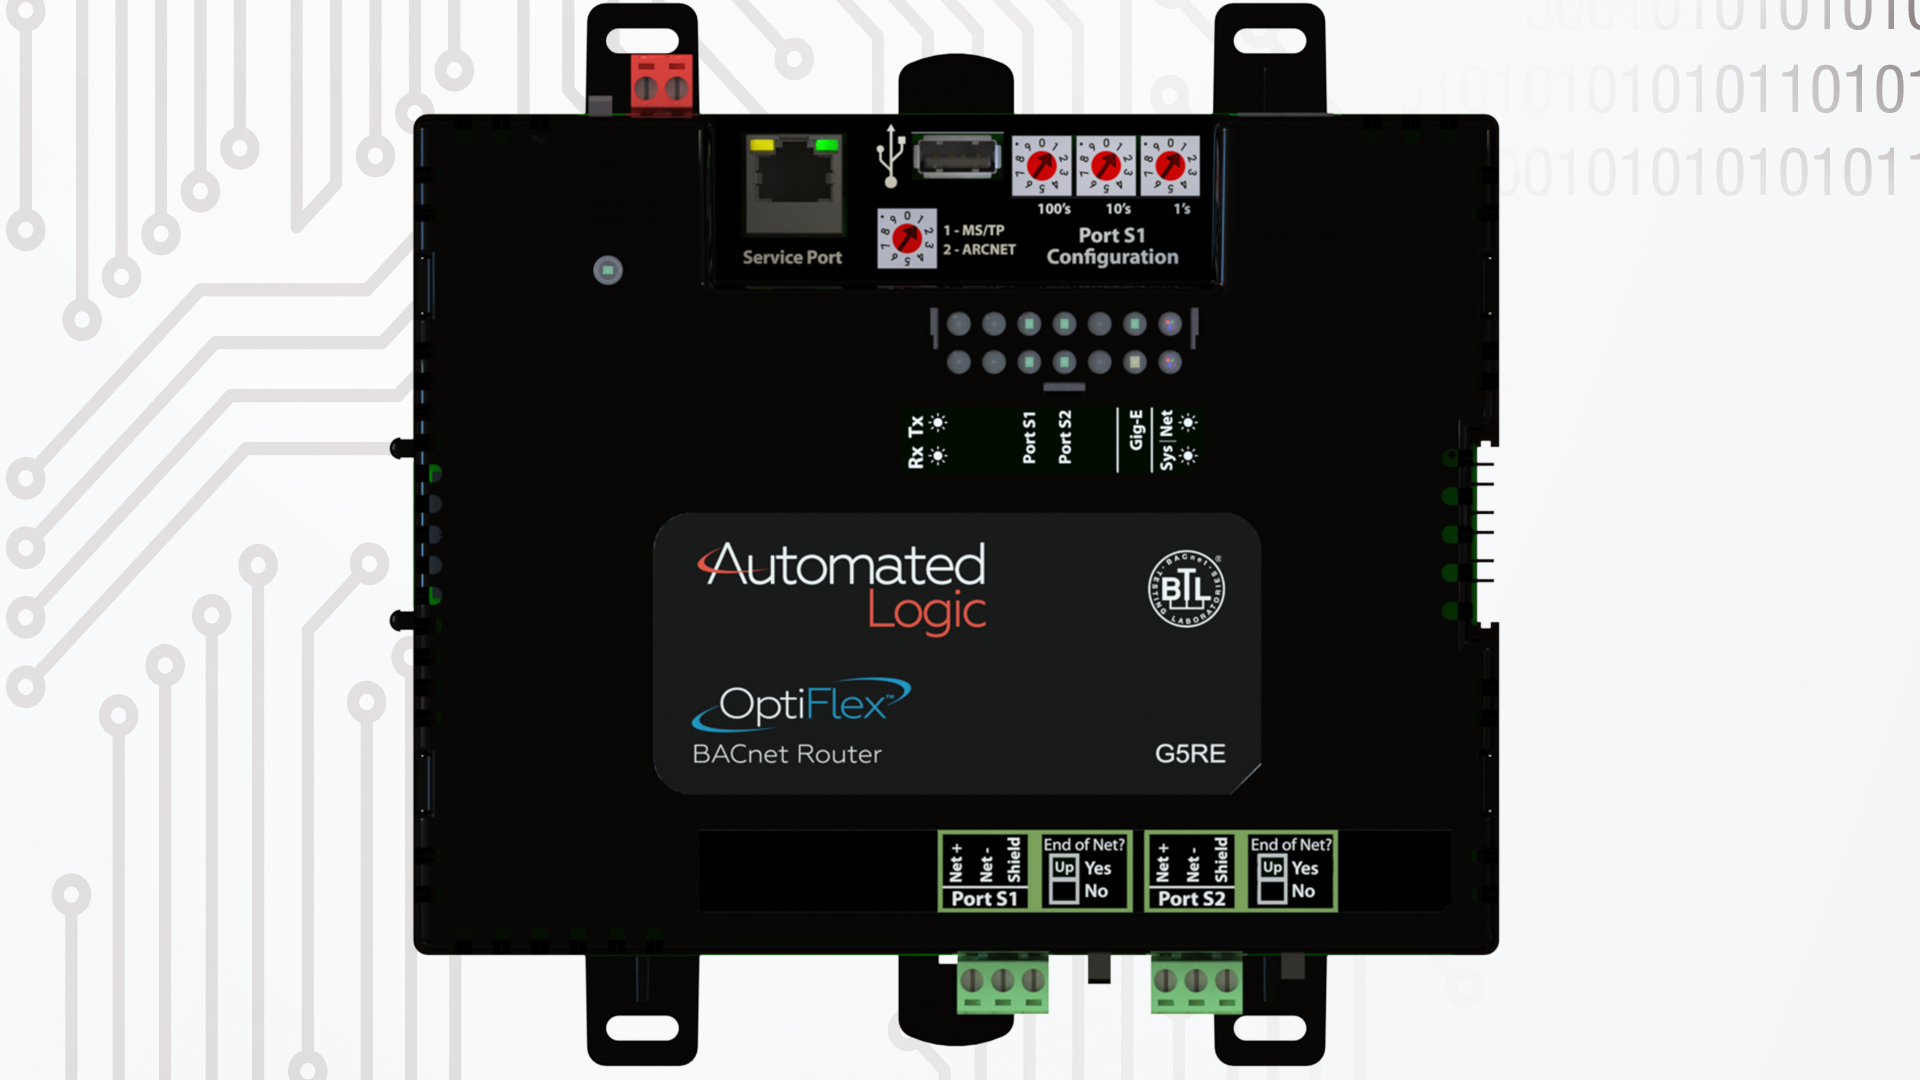 OptiFlex-BACnet-router-model-G5RE-top-view